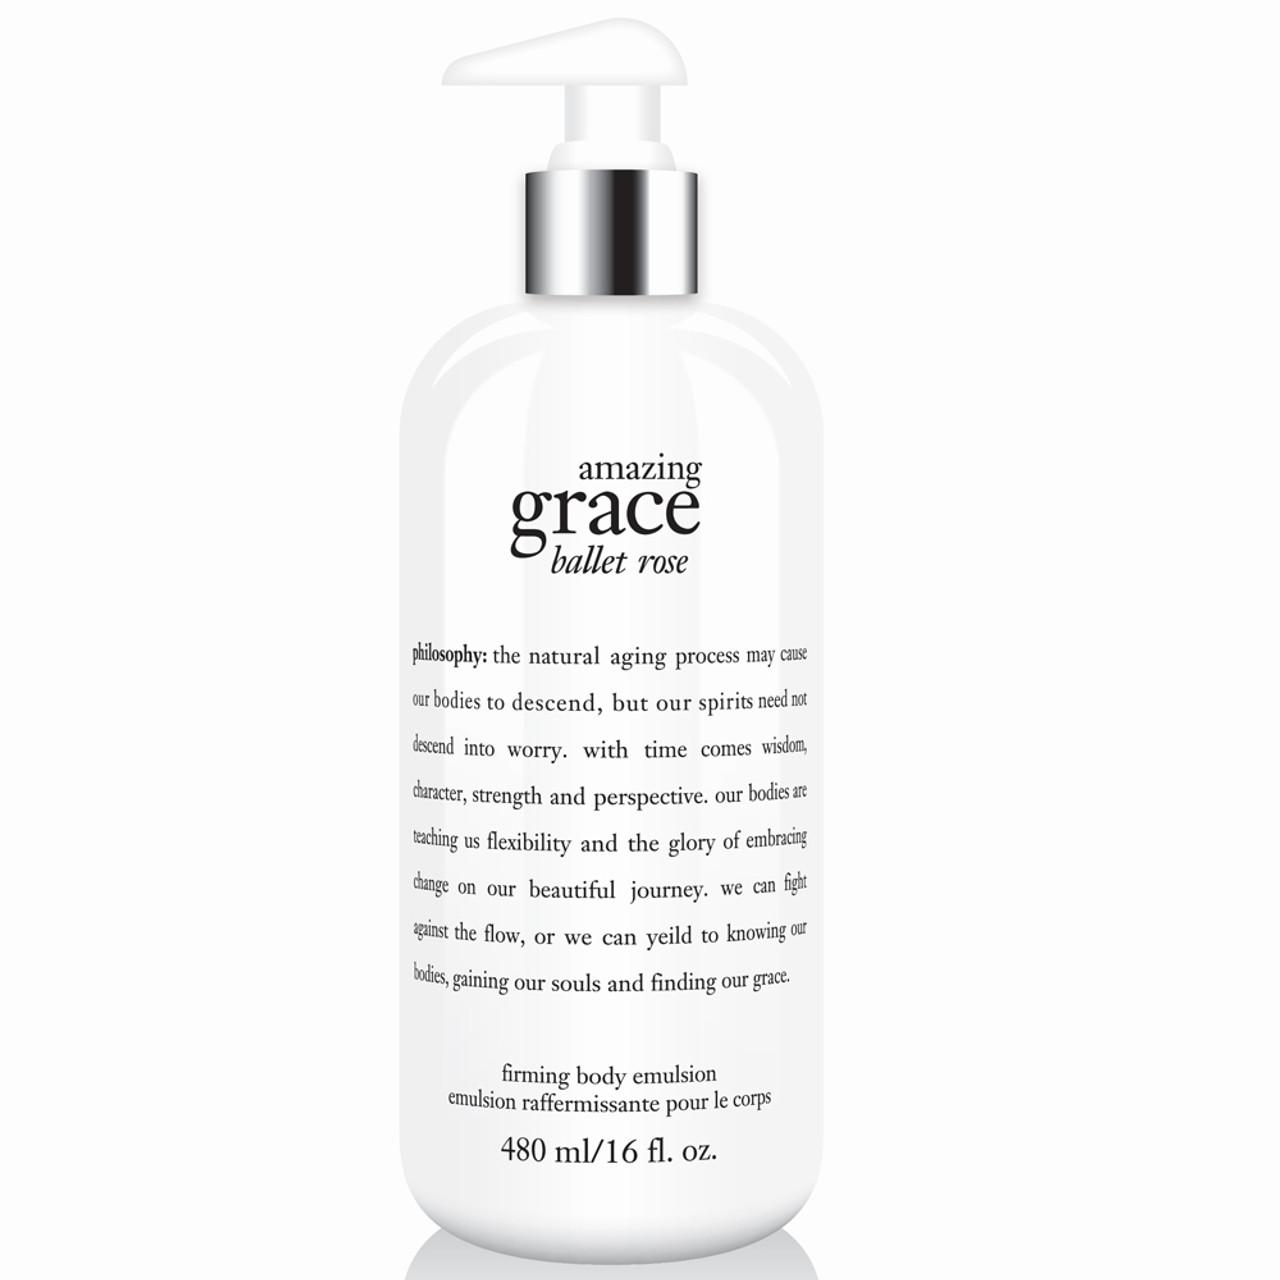 philosophy Amazing Grace Ballet Rose Firming Body Emulsion BeautifiedYou.com